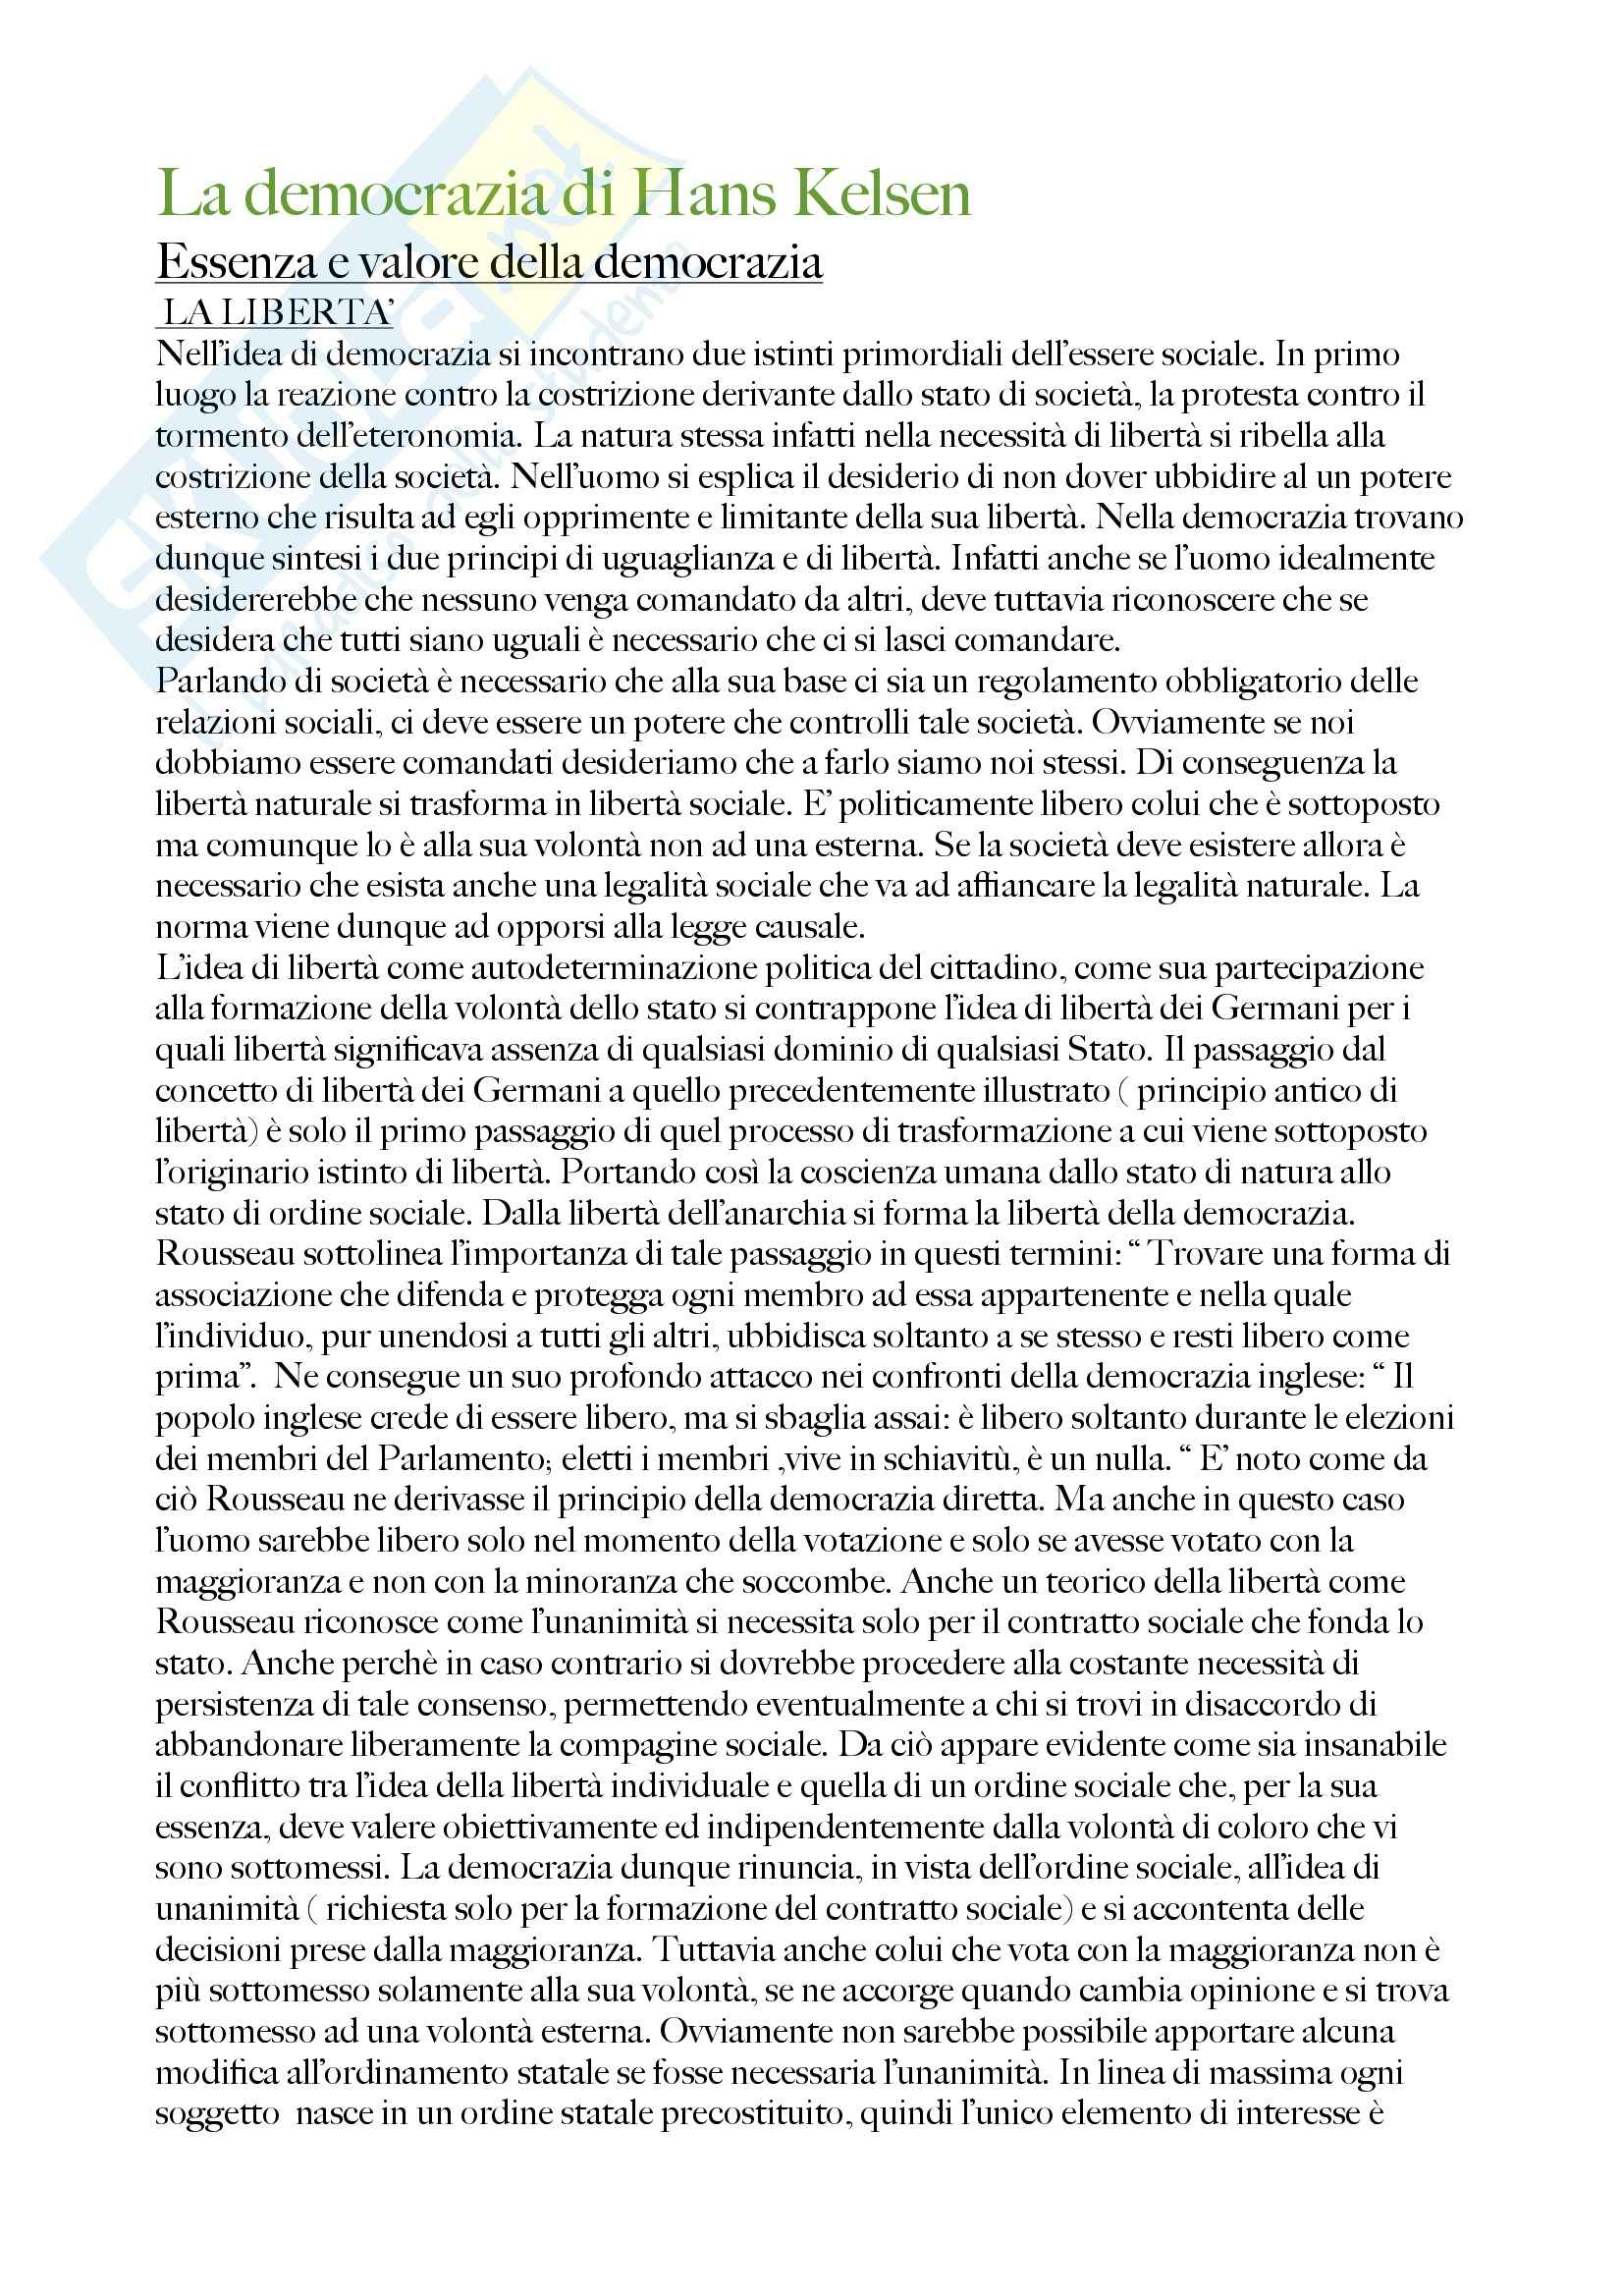 La democrazia, Kelsen - Appunti